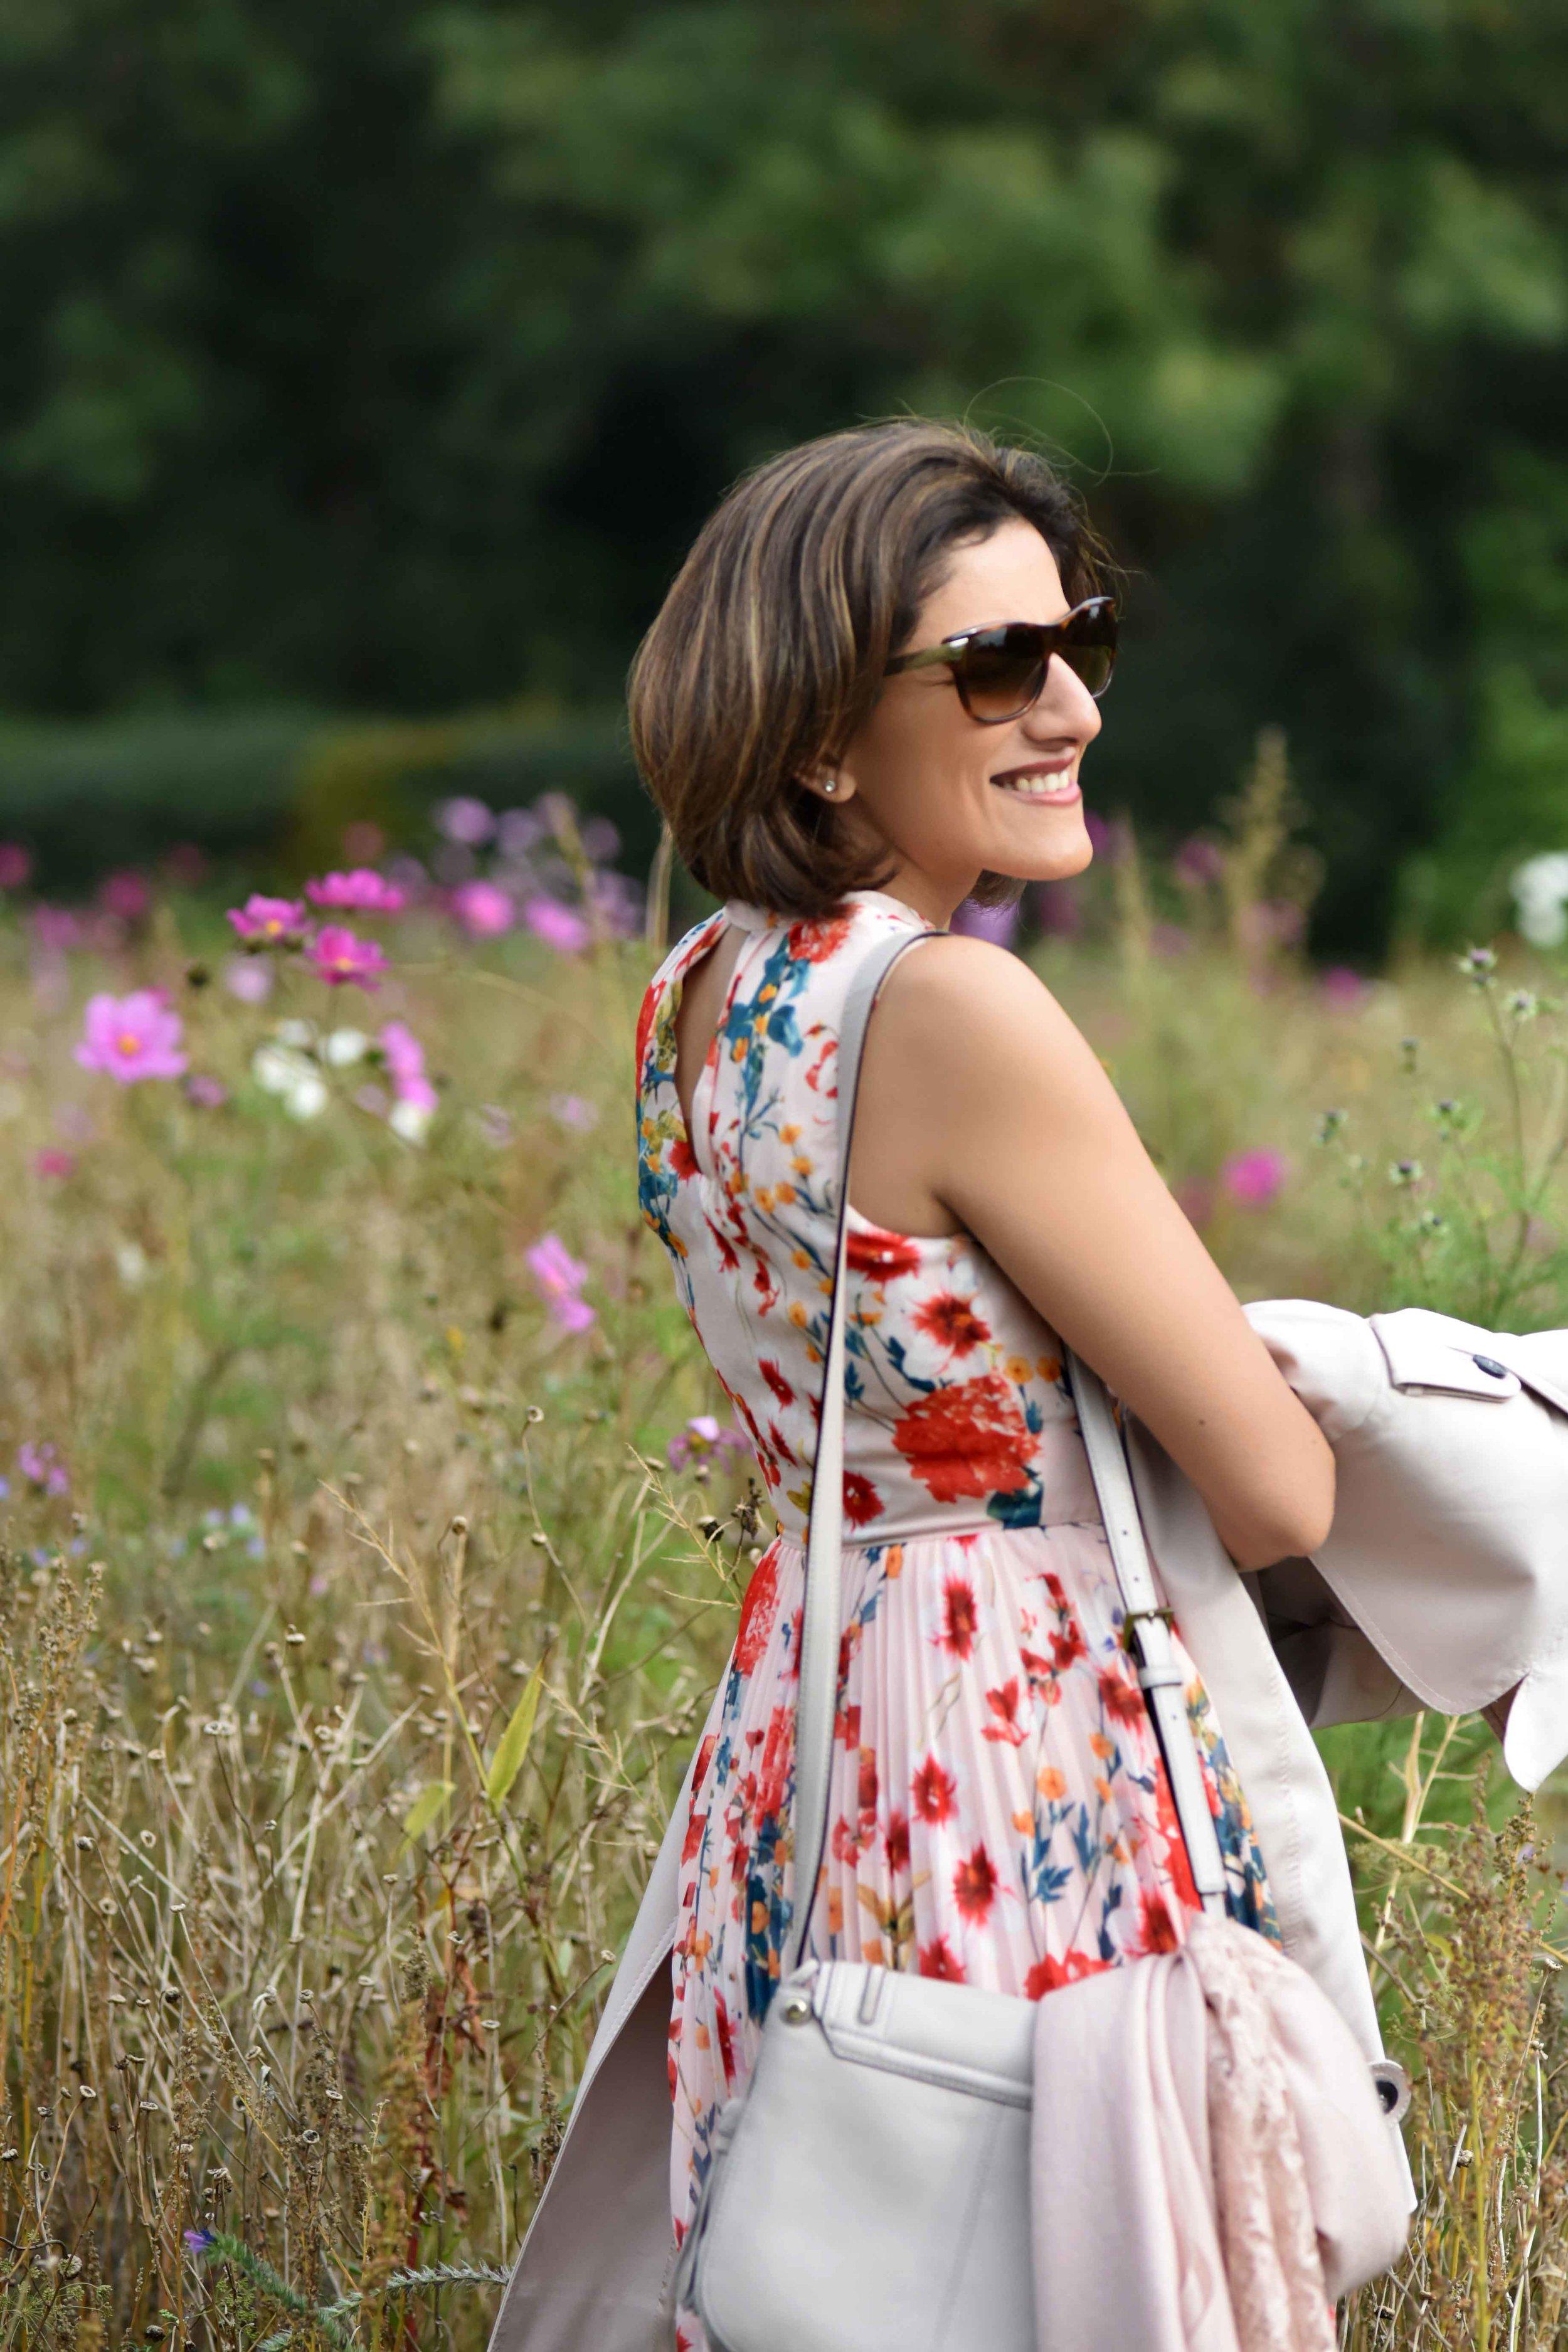 Karen Millen floral summer dress, Kate Spade bag, flower fields, Coworth Park hotel, Ascot. Image©sourcingstyle.com